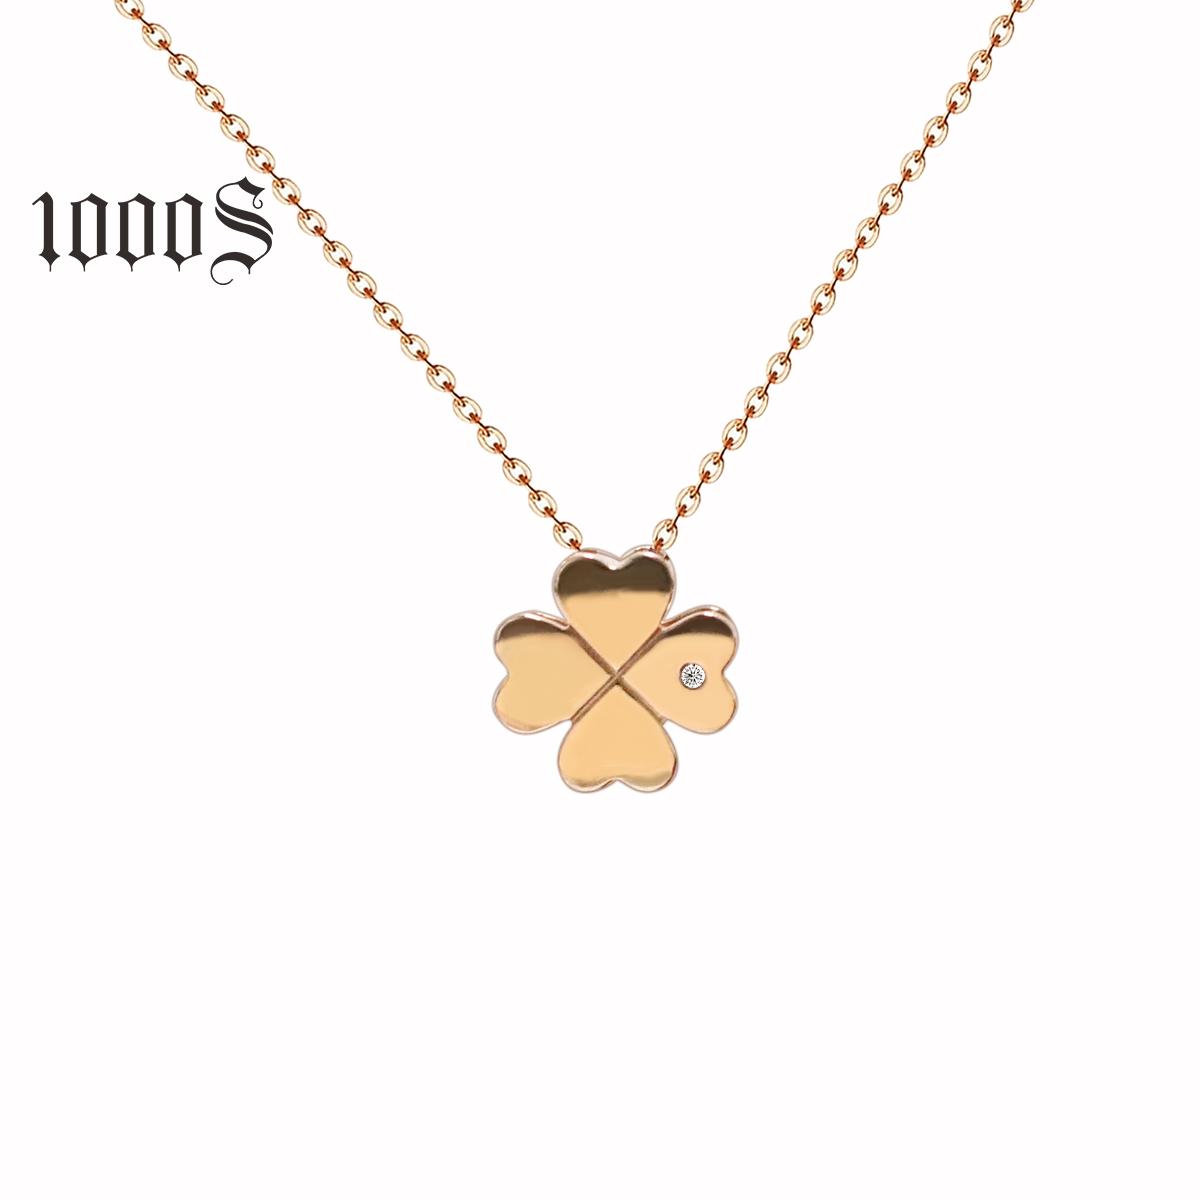 d7cb7c8e0a941 China Lucky Clover Necklace, China Lucky Clover Necklace ...